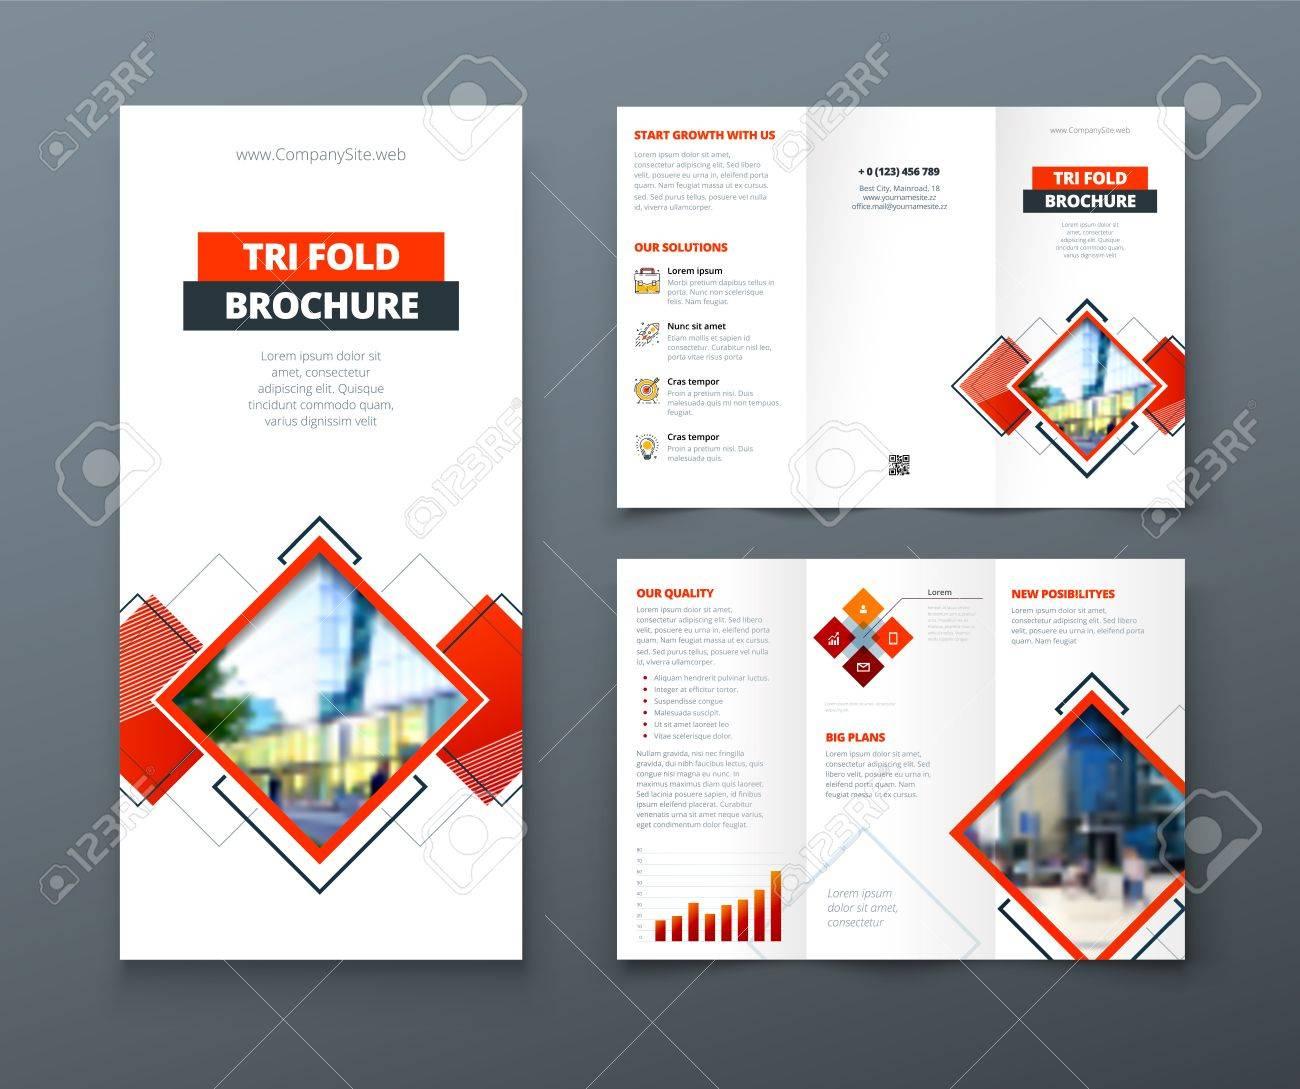 tri fold brochure design corporate business template for tri